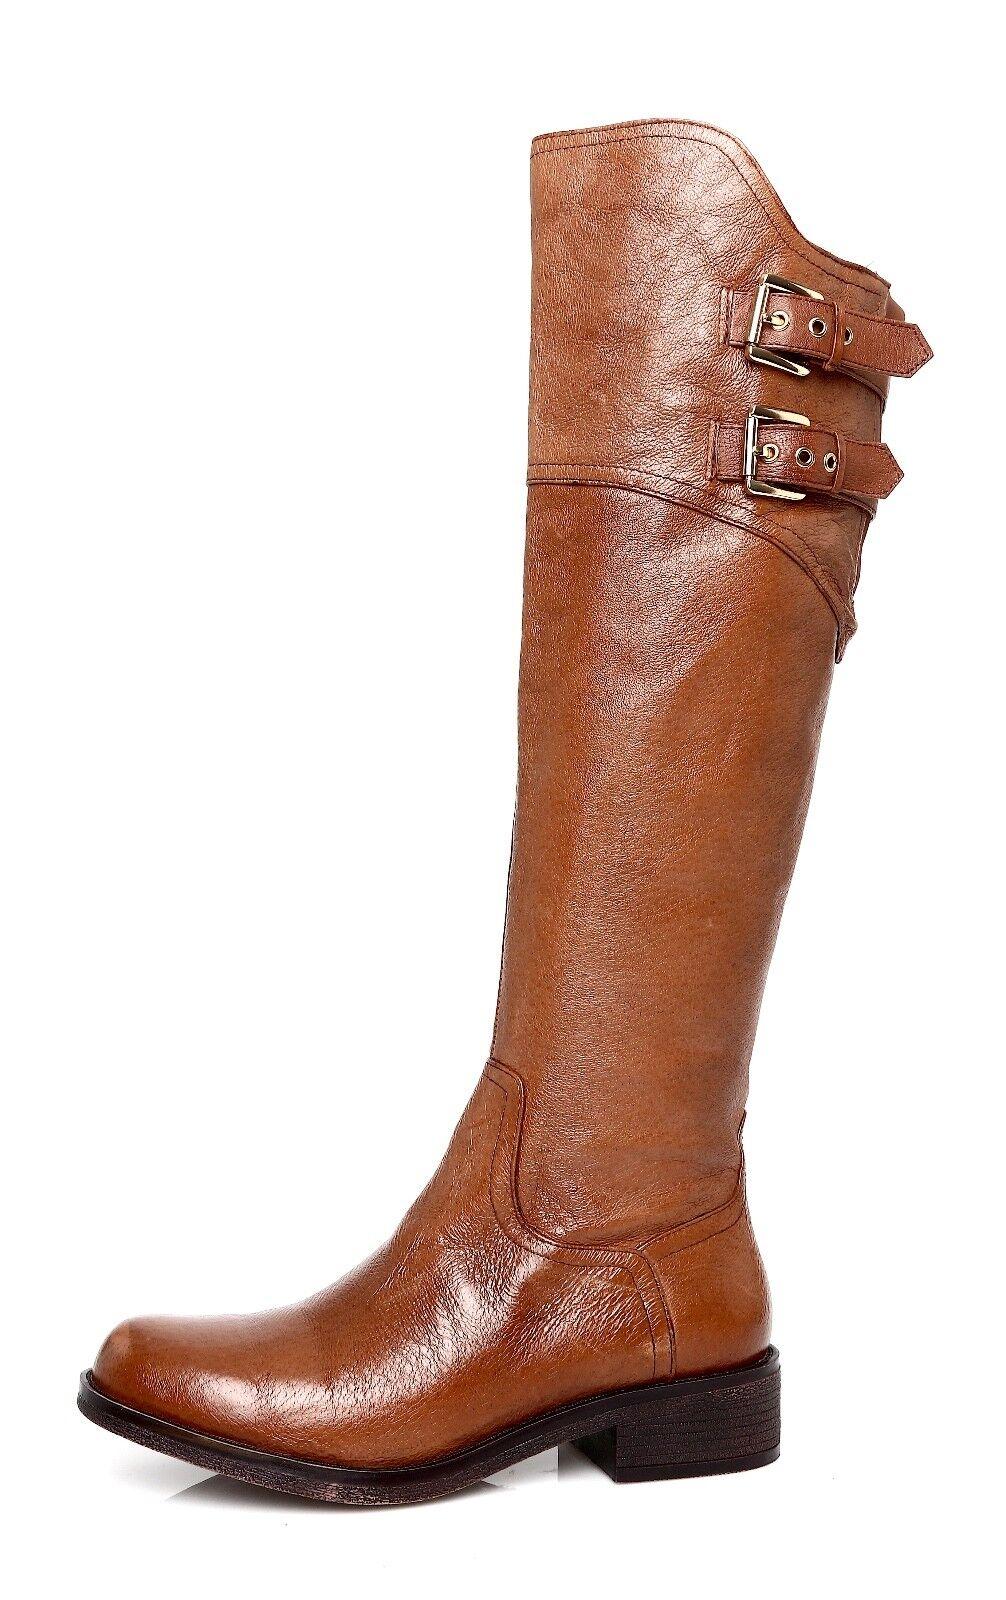 Steve Madden Overt Women's Leather Brown Boot Sz 6 M 4454 *